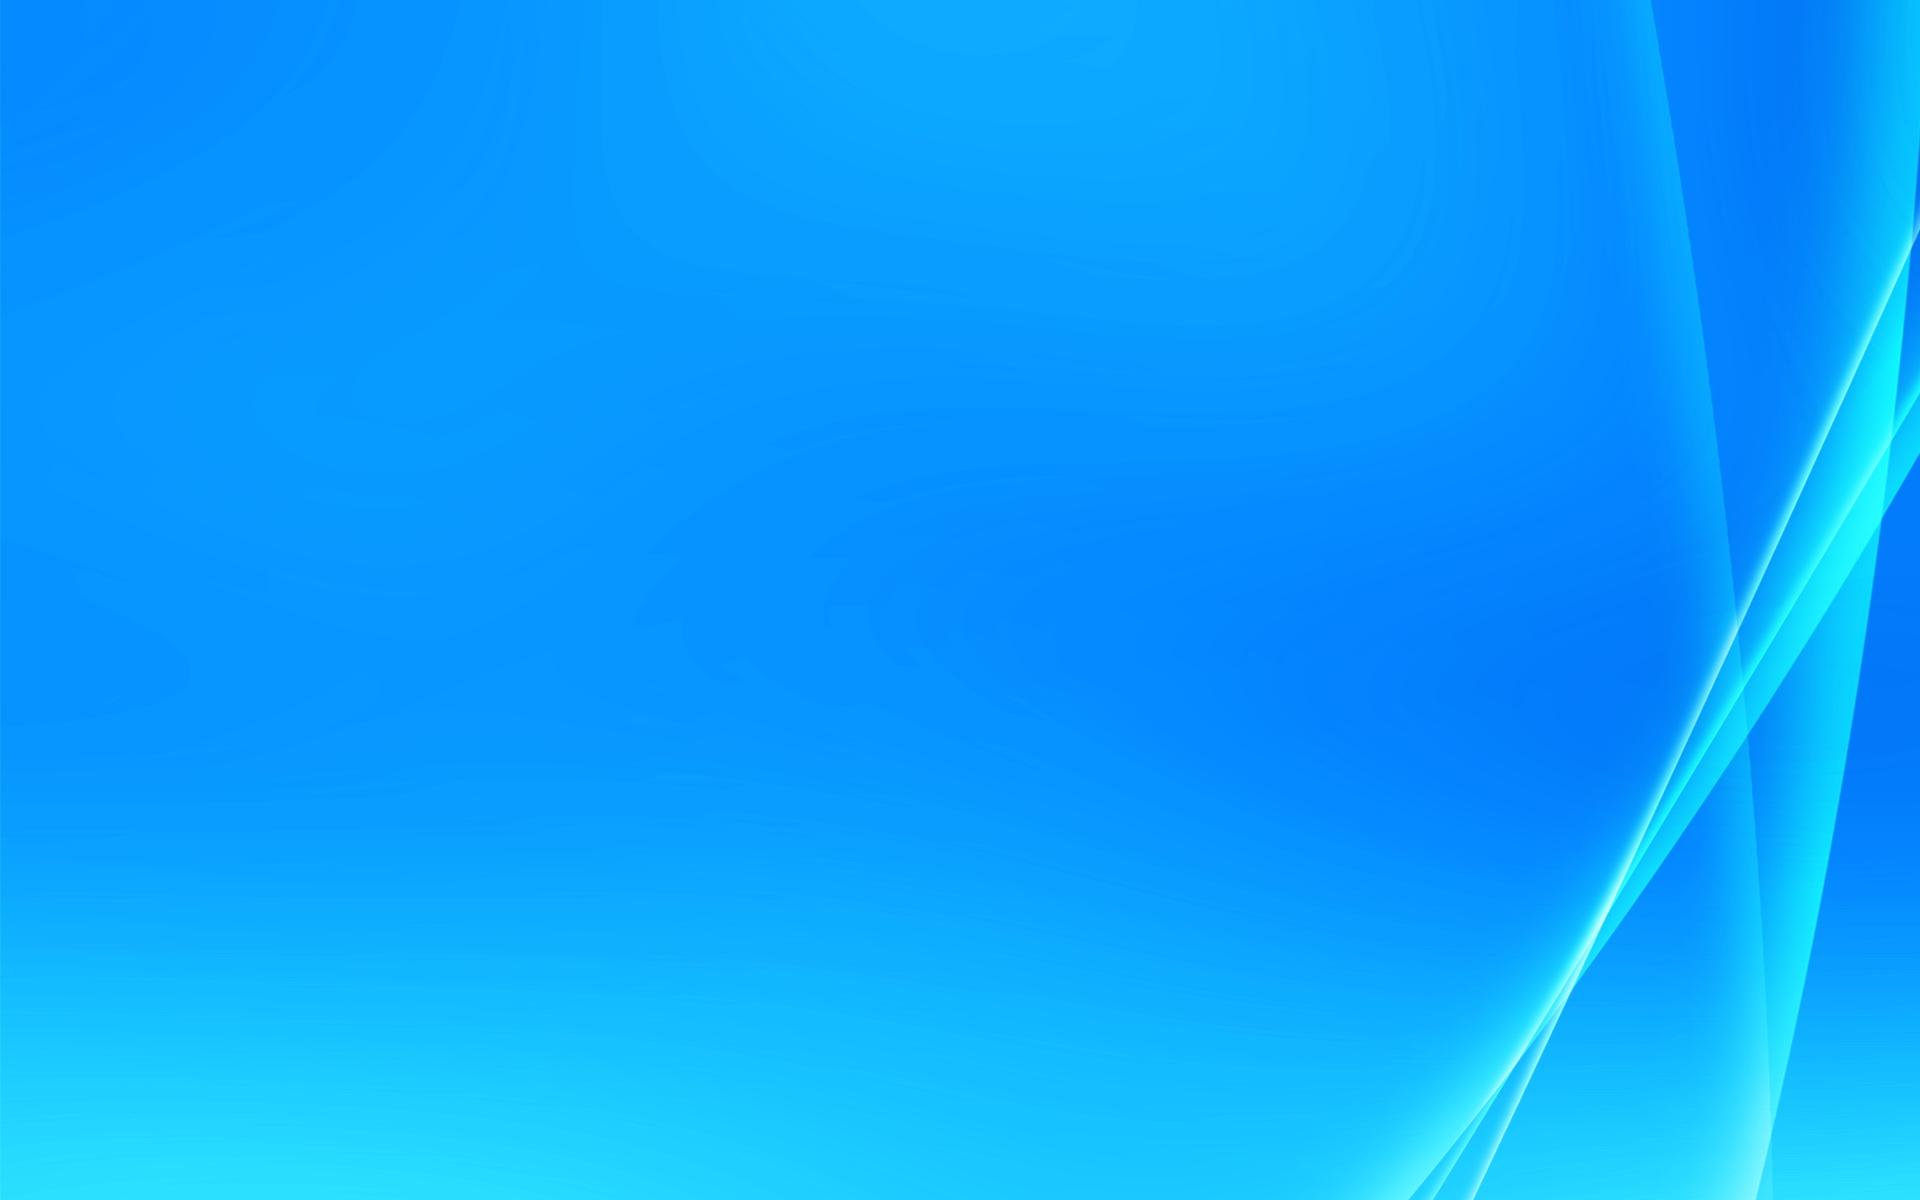 Открыток, картинки голубой фон для презентации